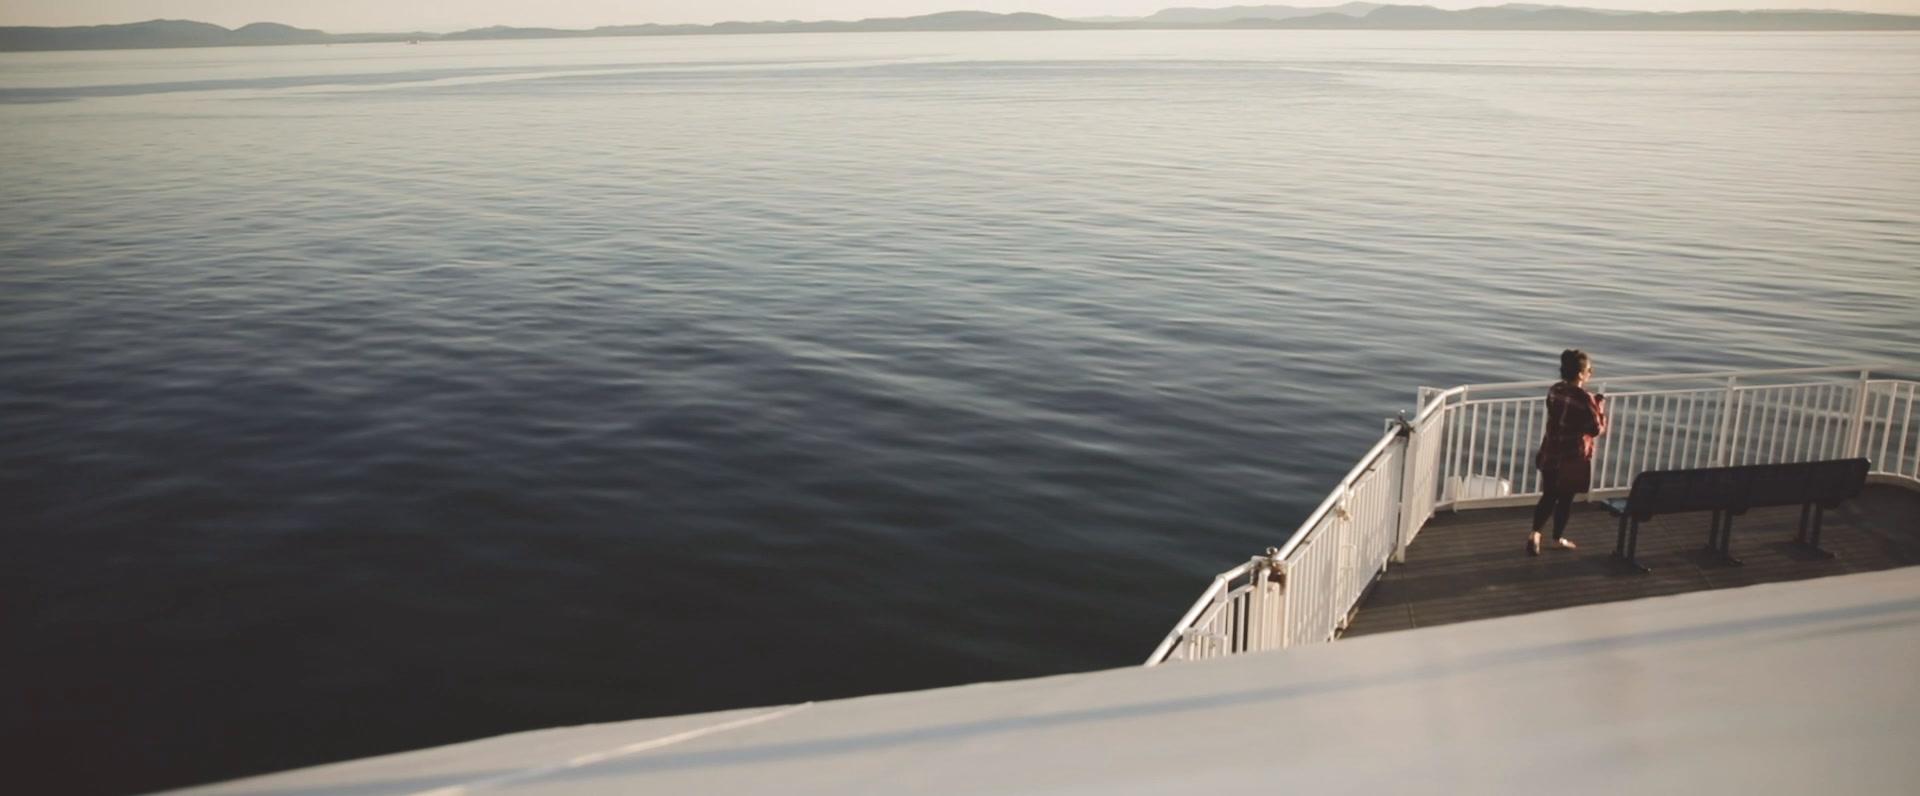 Callie + Zach | Galiano Island, Canada | Bodega Ridge